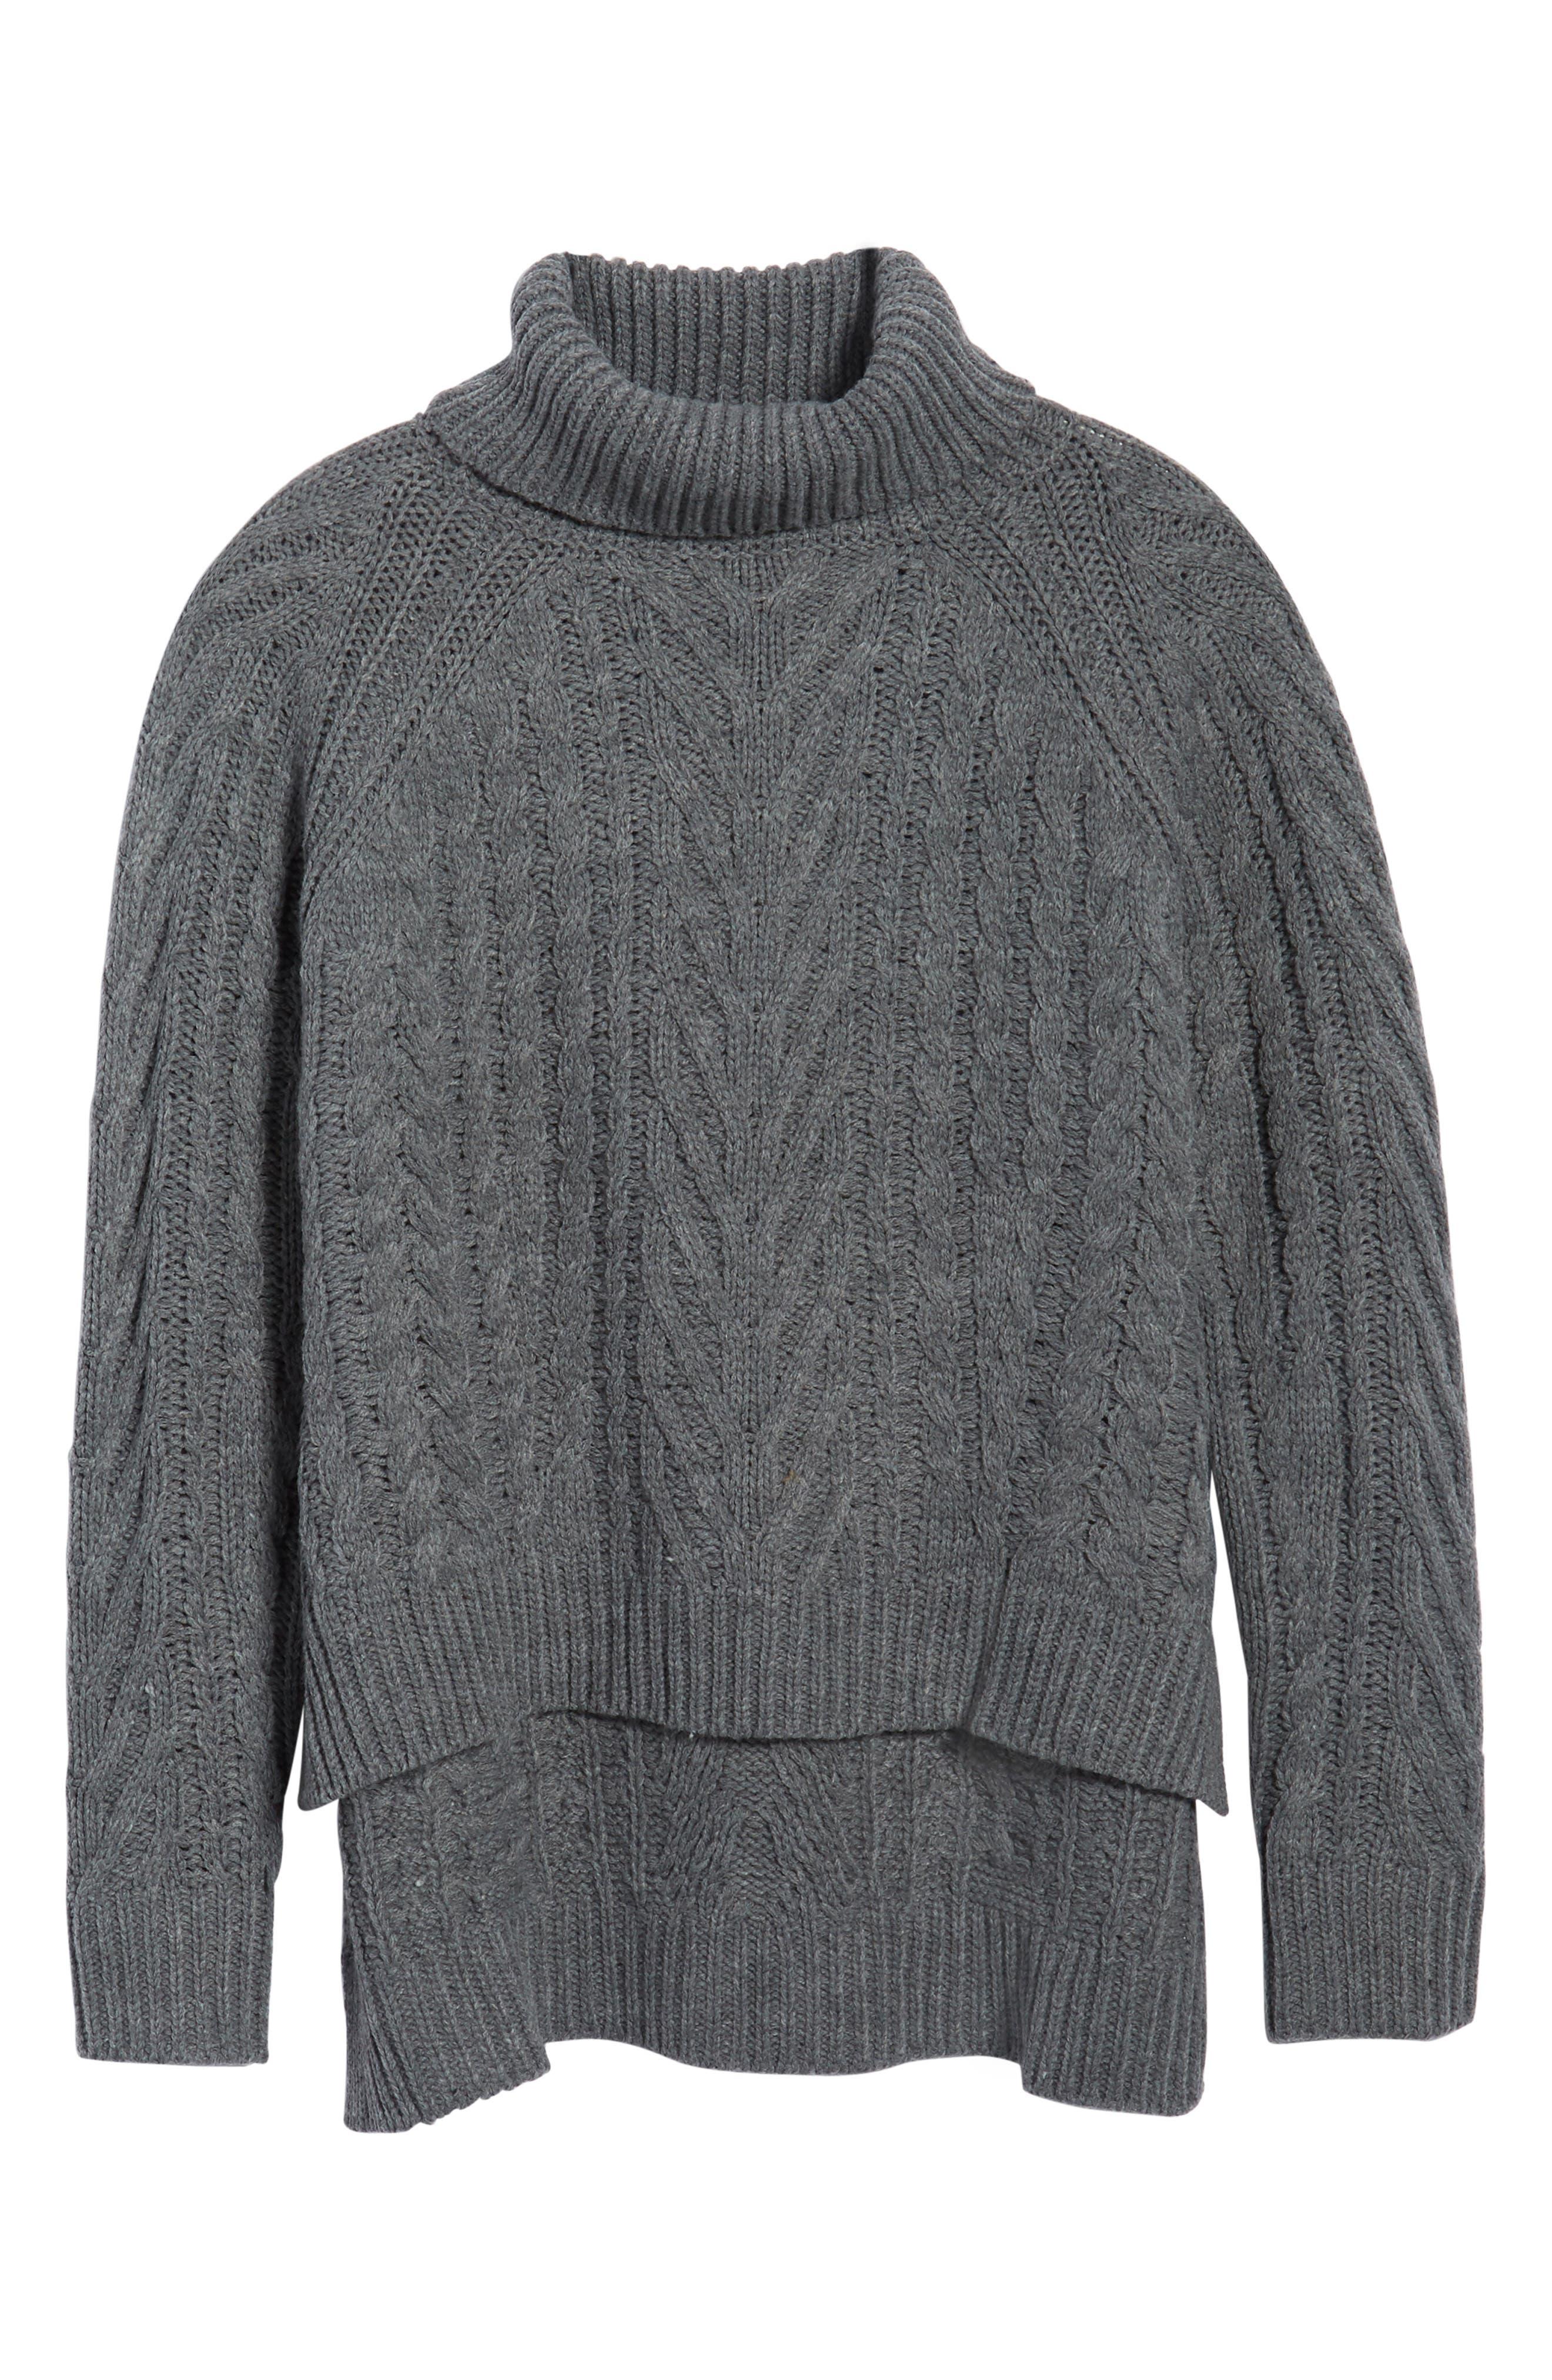 Cable Knit Turtleneck Sweater,                             Alternate thumbnail 6, color,                             020